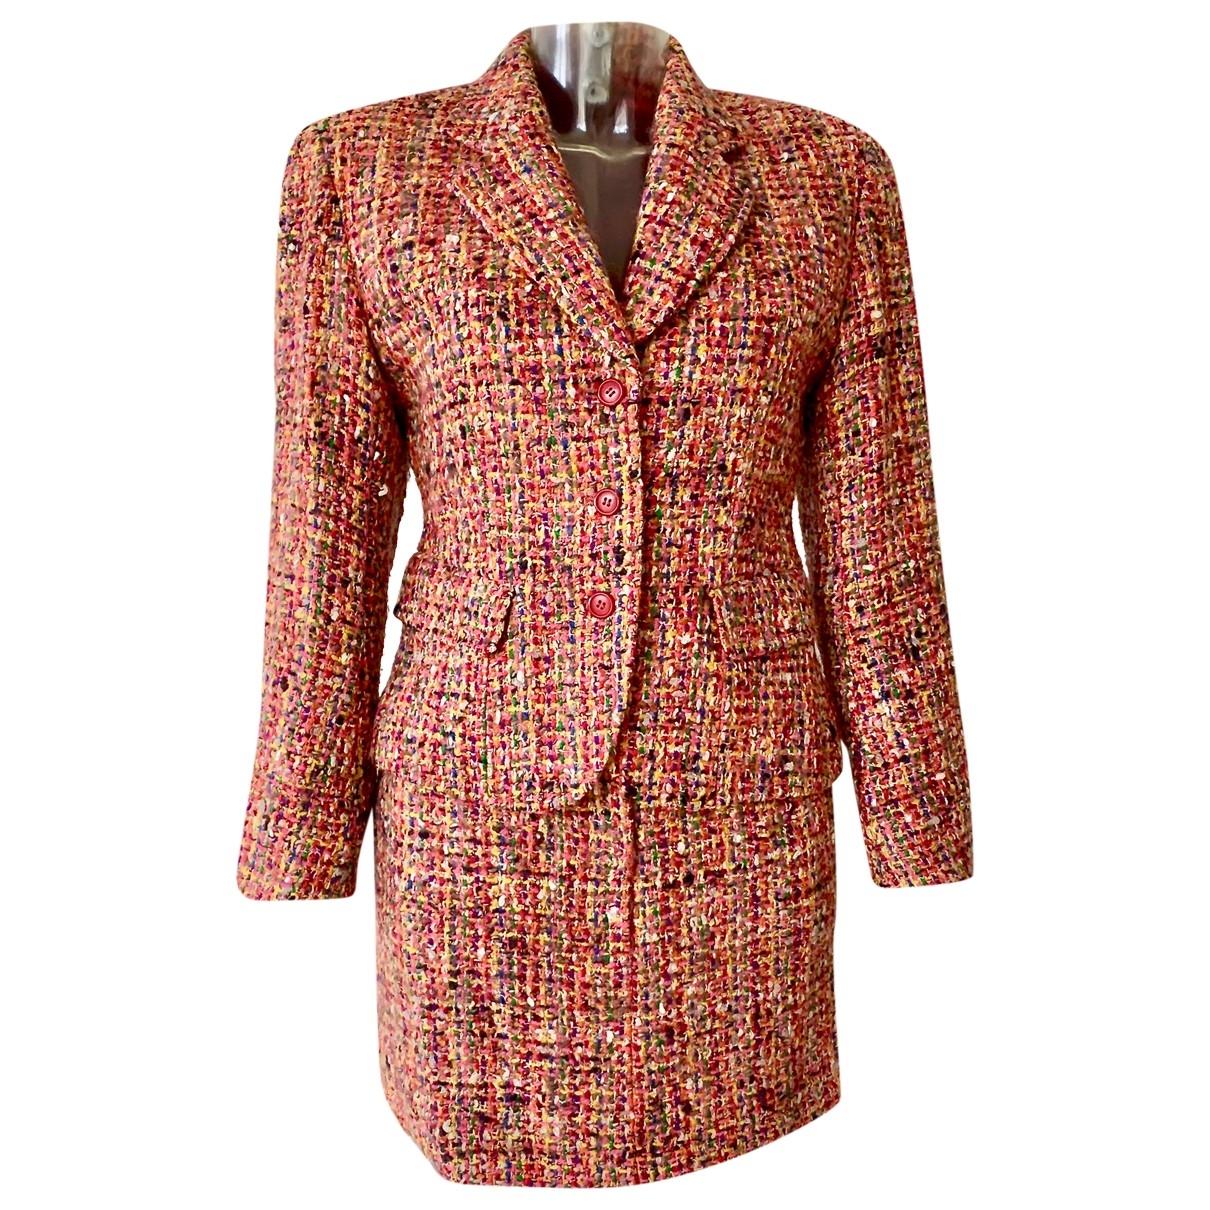 Kenzo - Veste   pour femme en tweed - multicolore